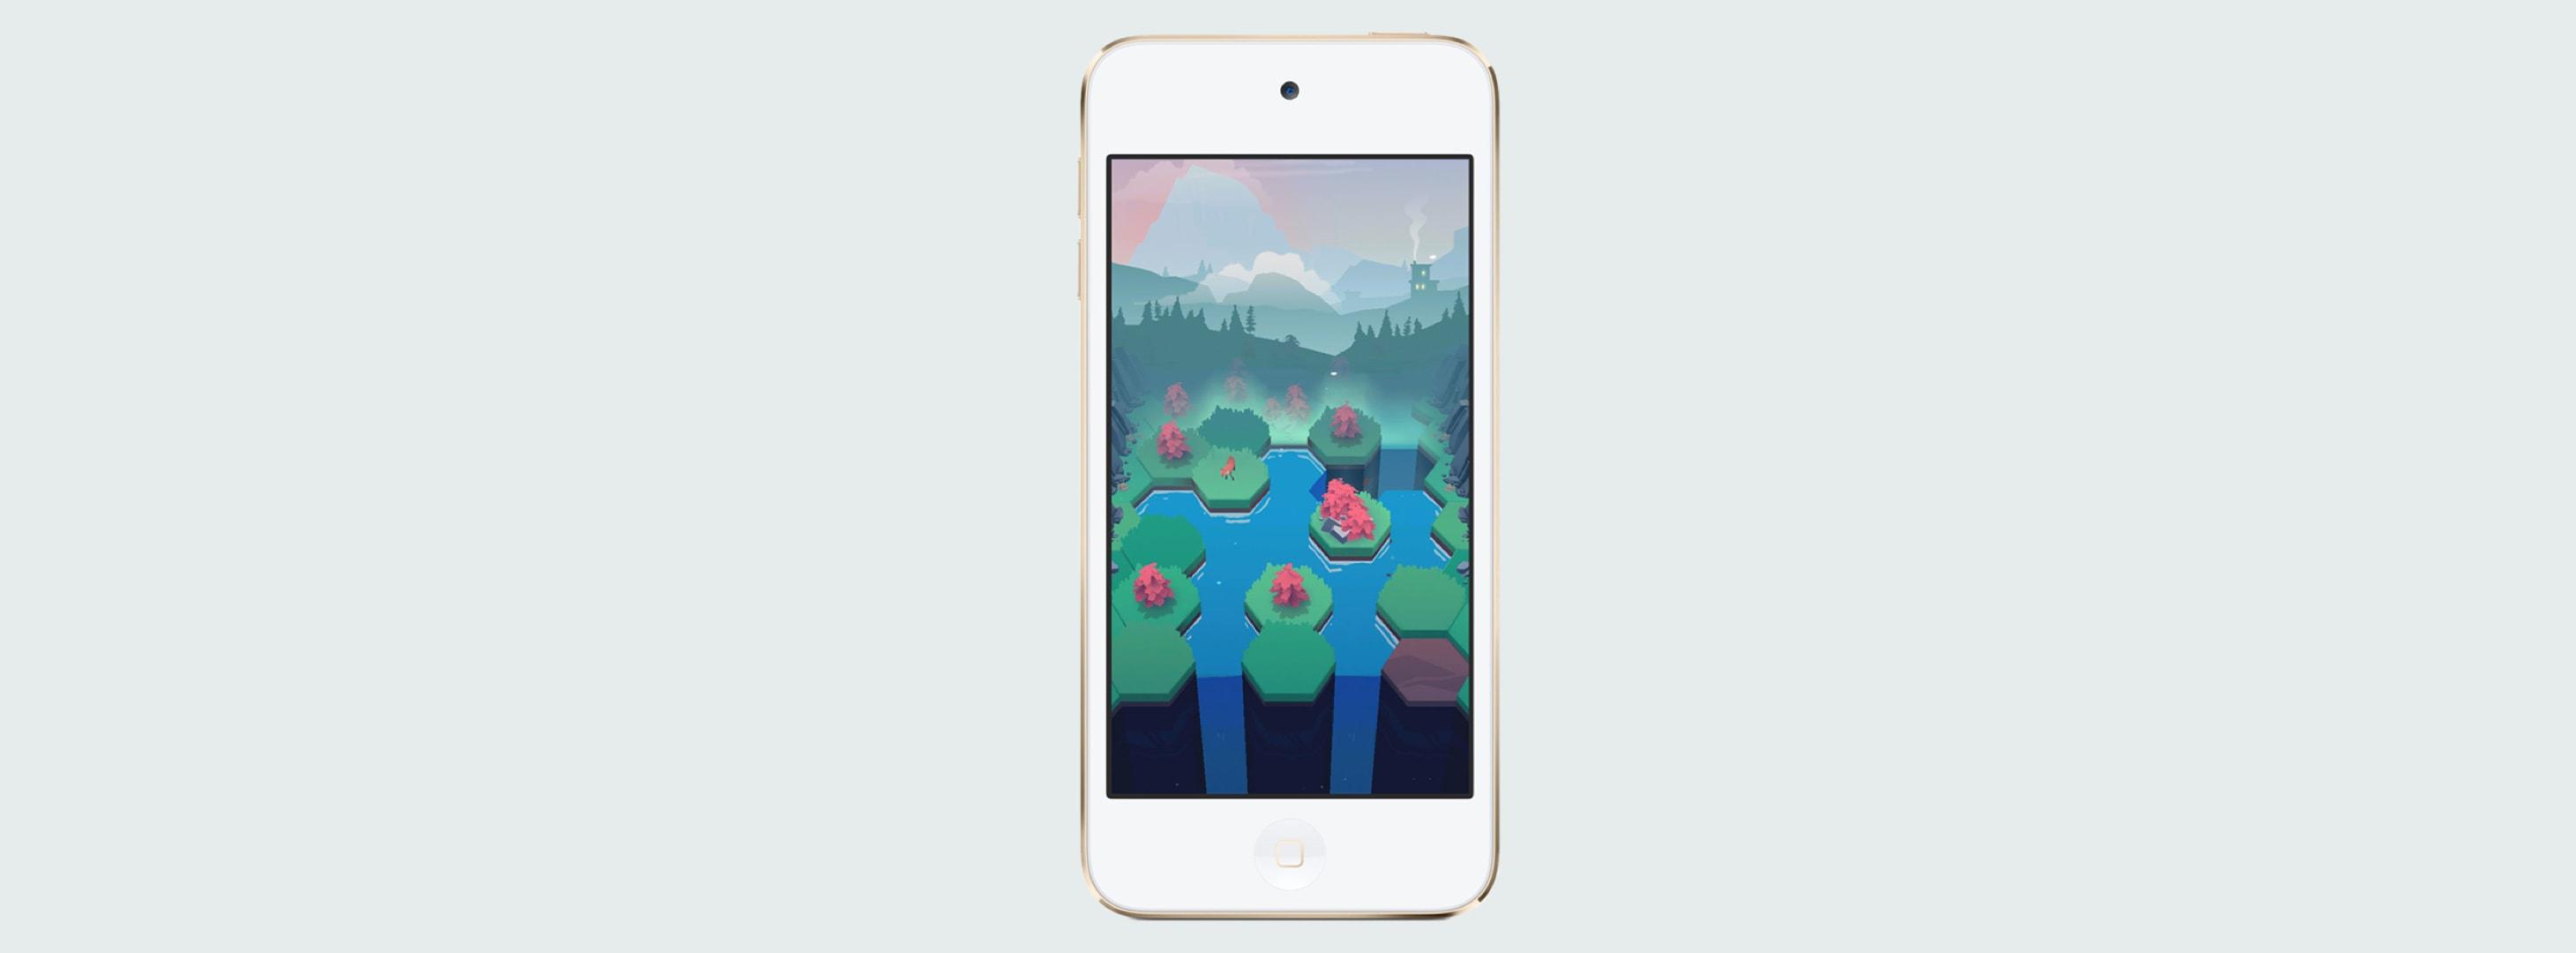 allapplenews-ipod-touch-games